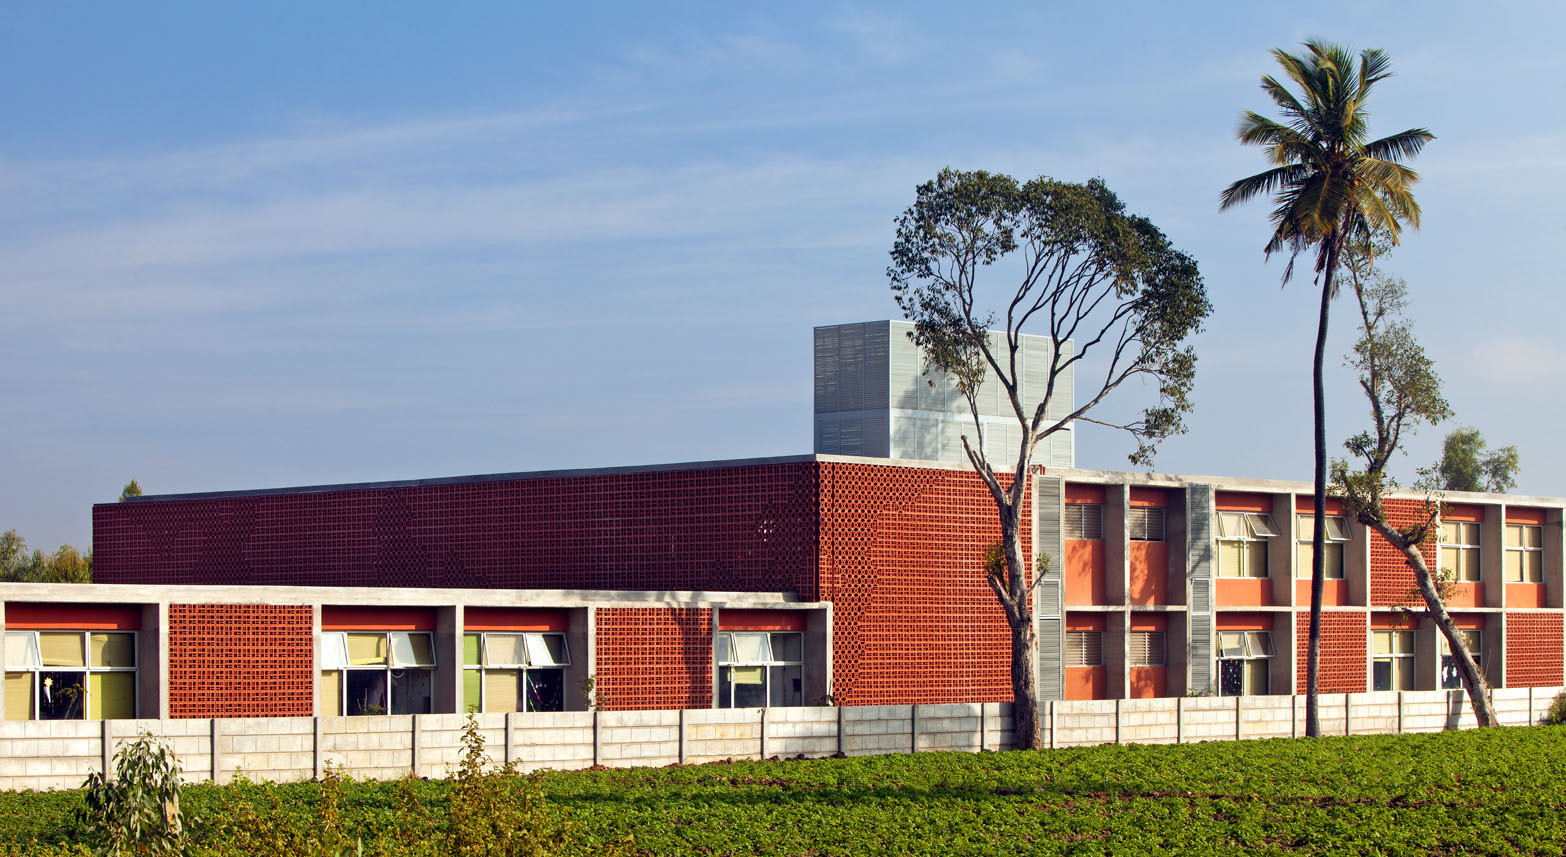 Gallery of dps kindergarden school khosla associates 4 for Design4 architects bangalore